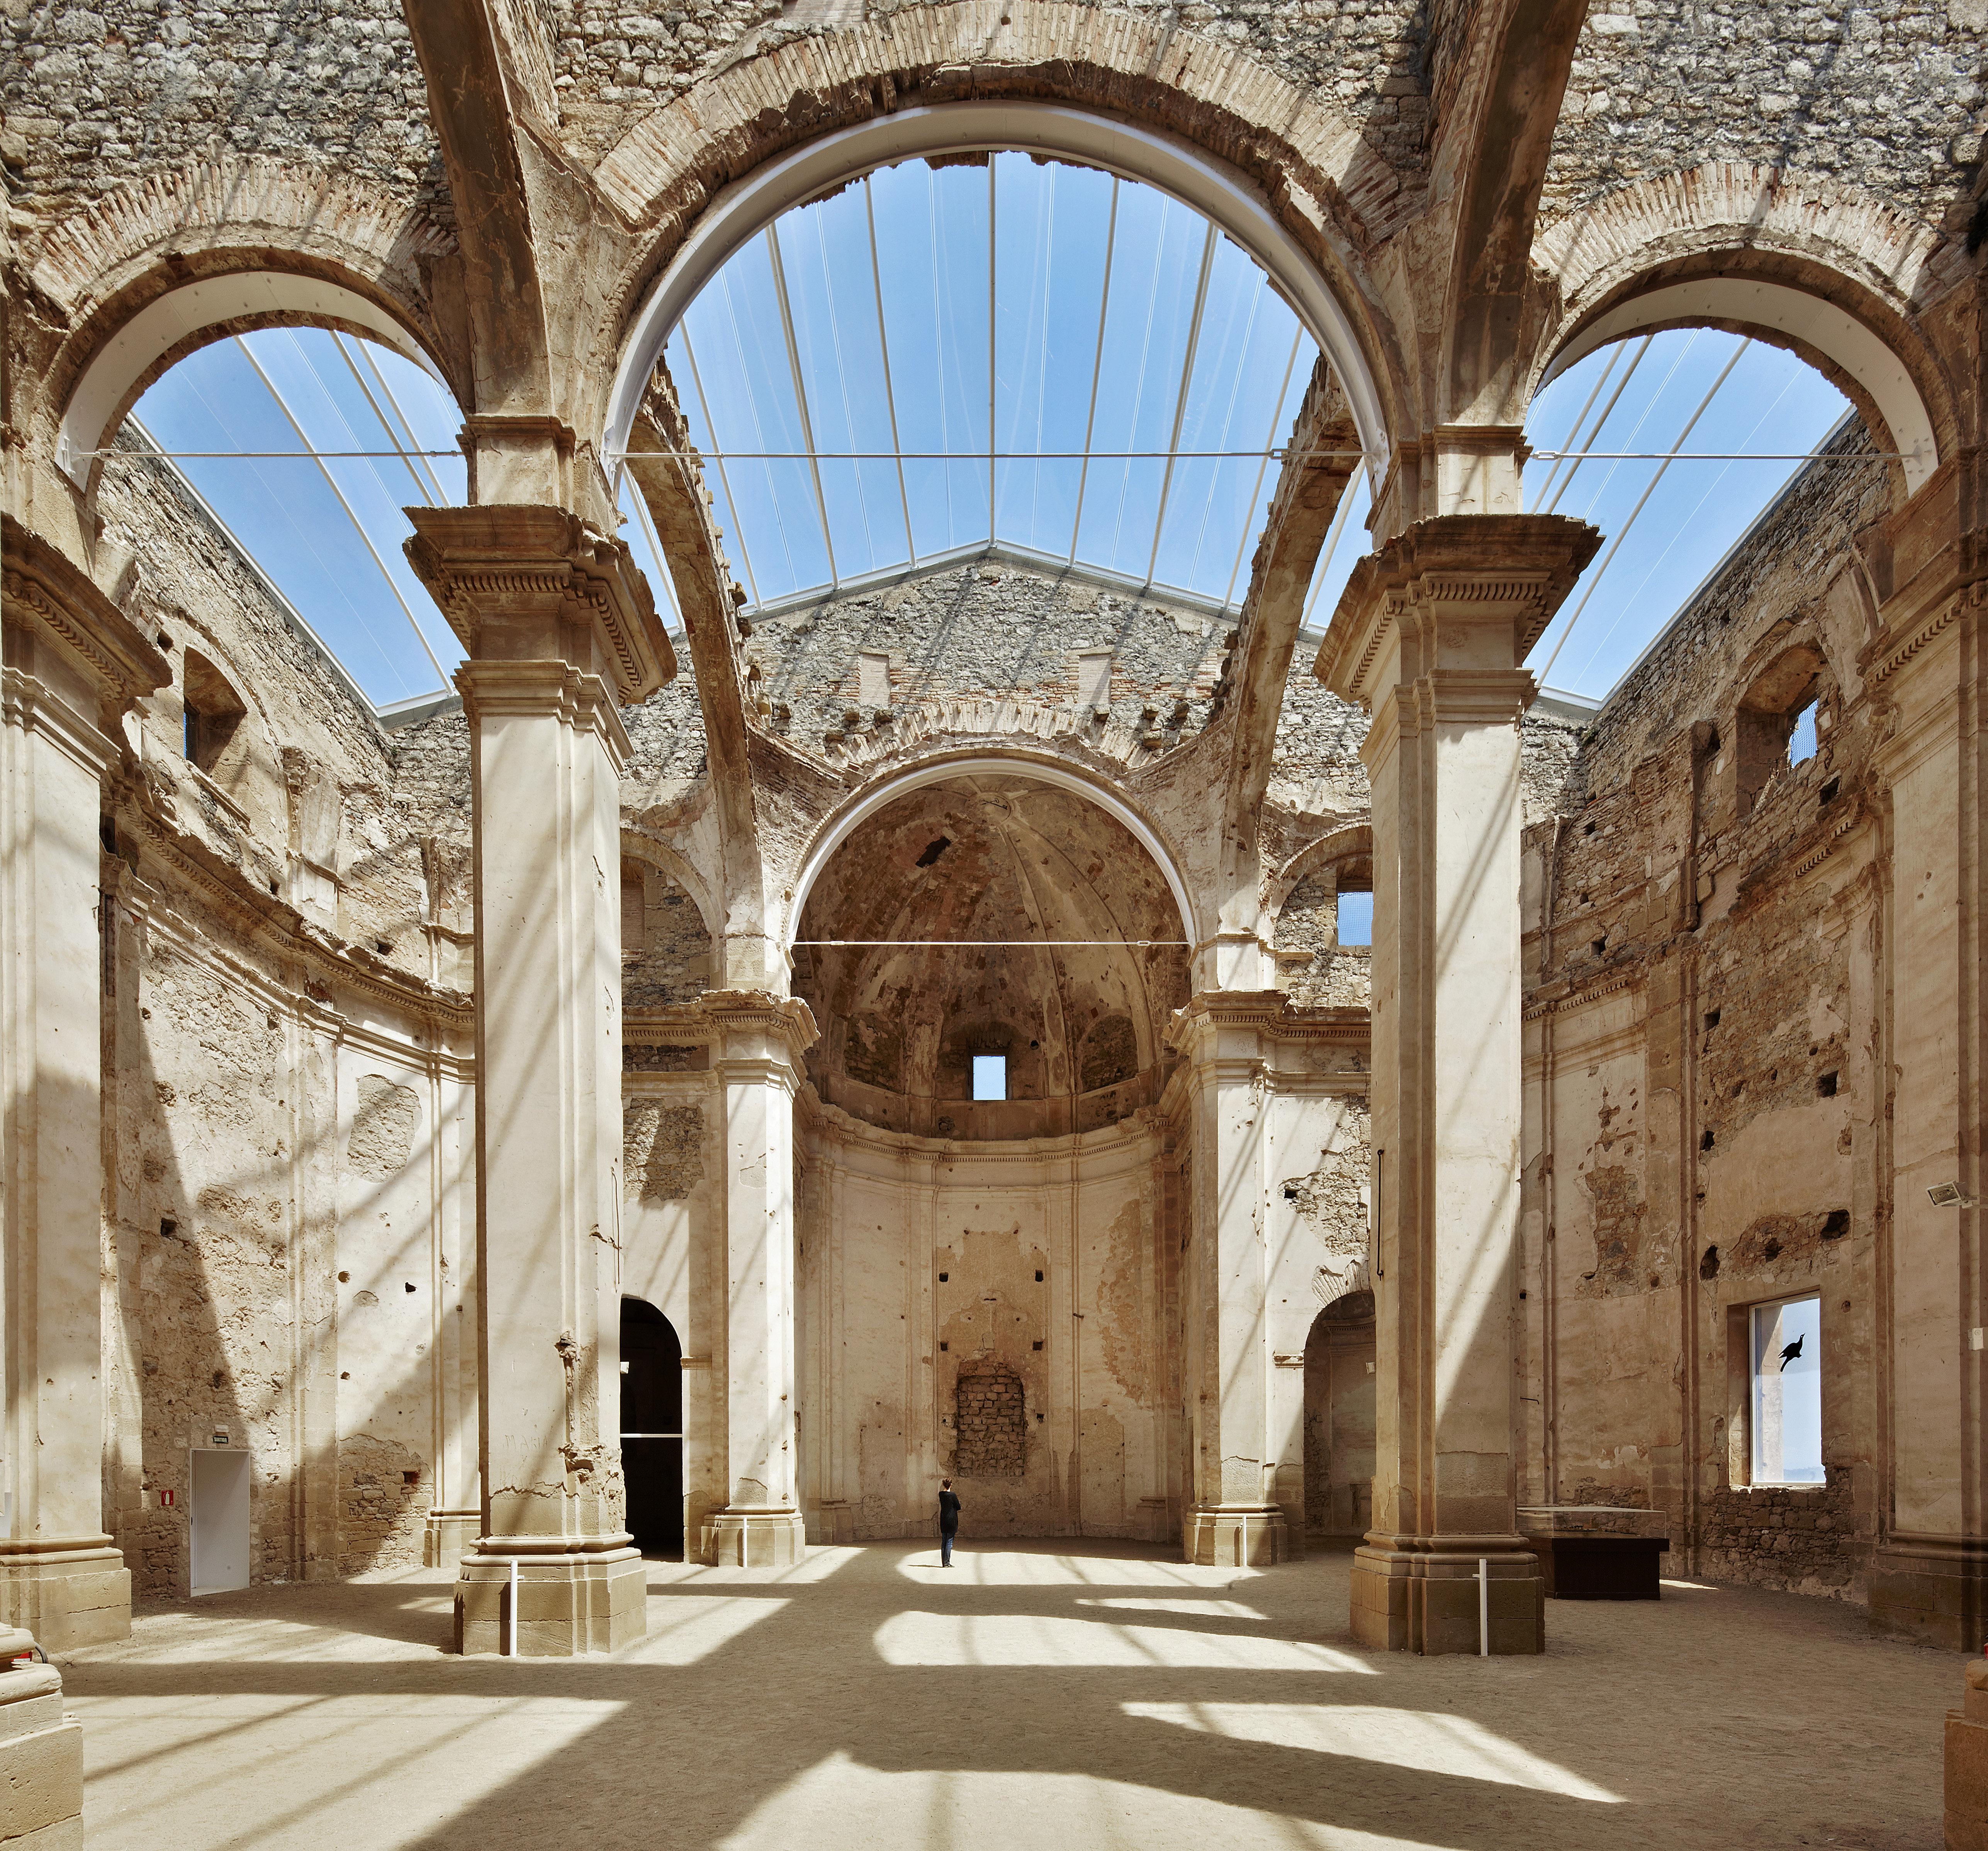 Rehabilitacion de la iglesia Corbera D'Ebre Ferran Vizoso, Nuria Bordas, Jordi Garriga